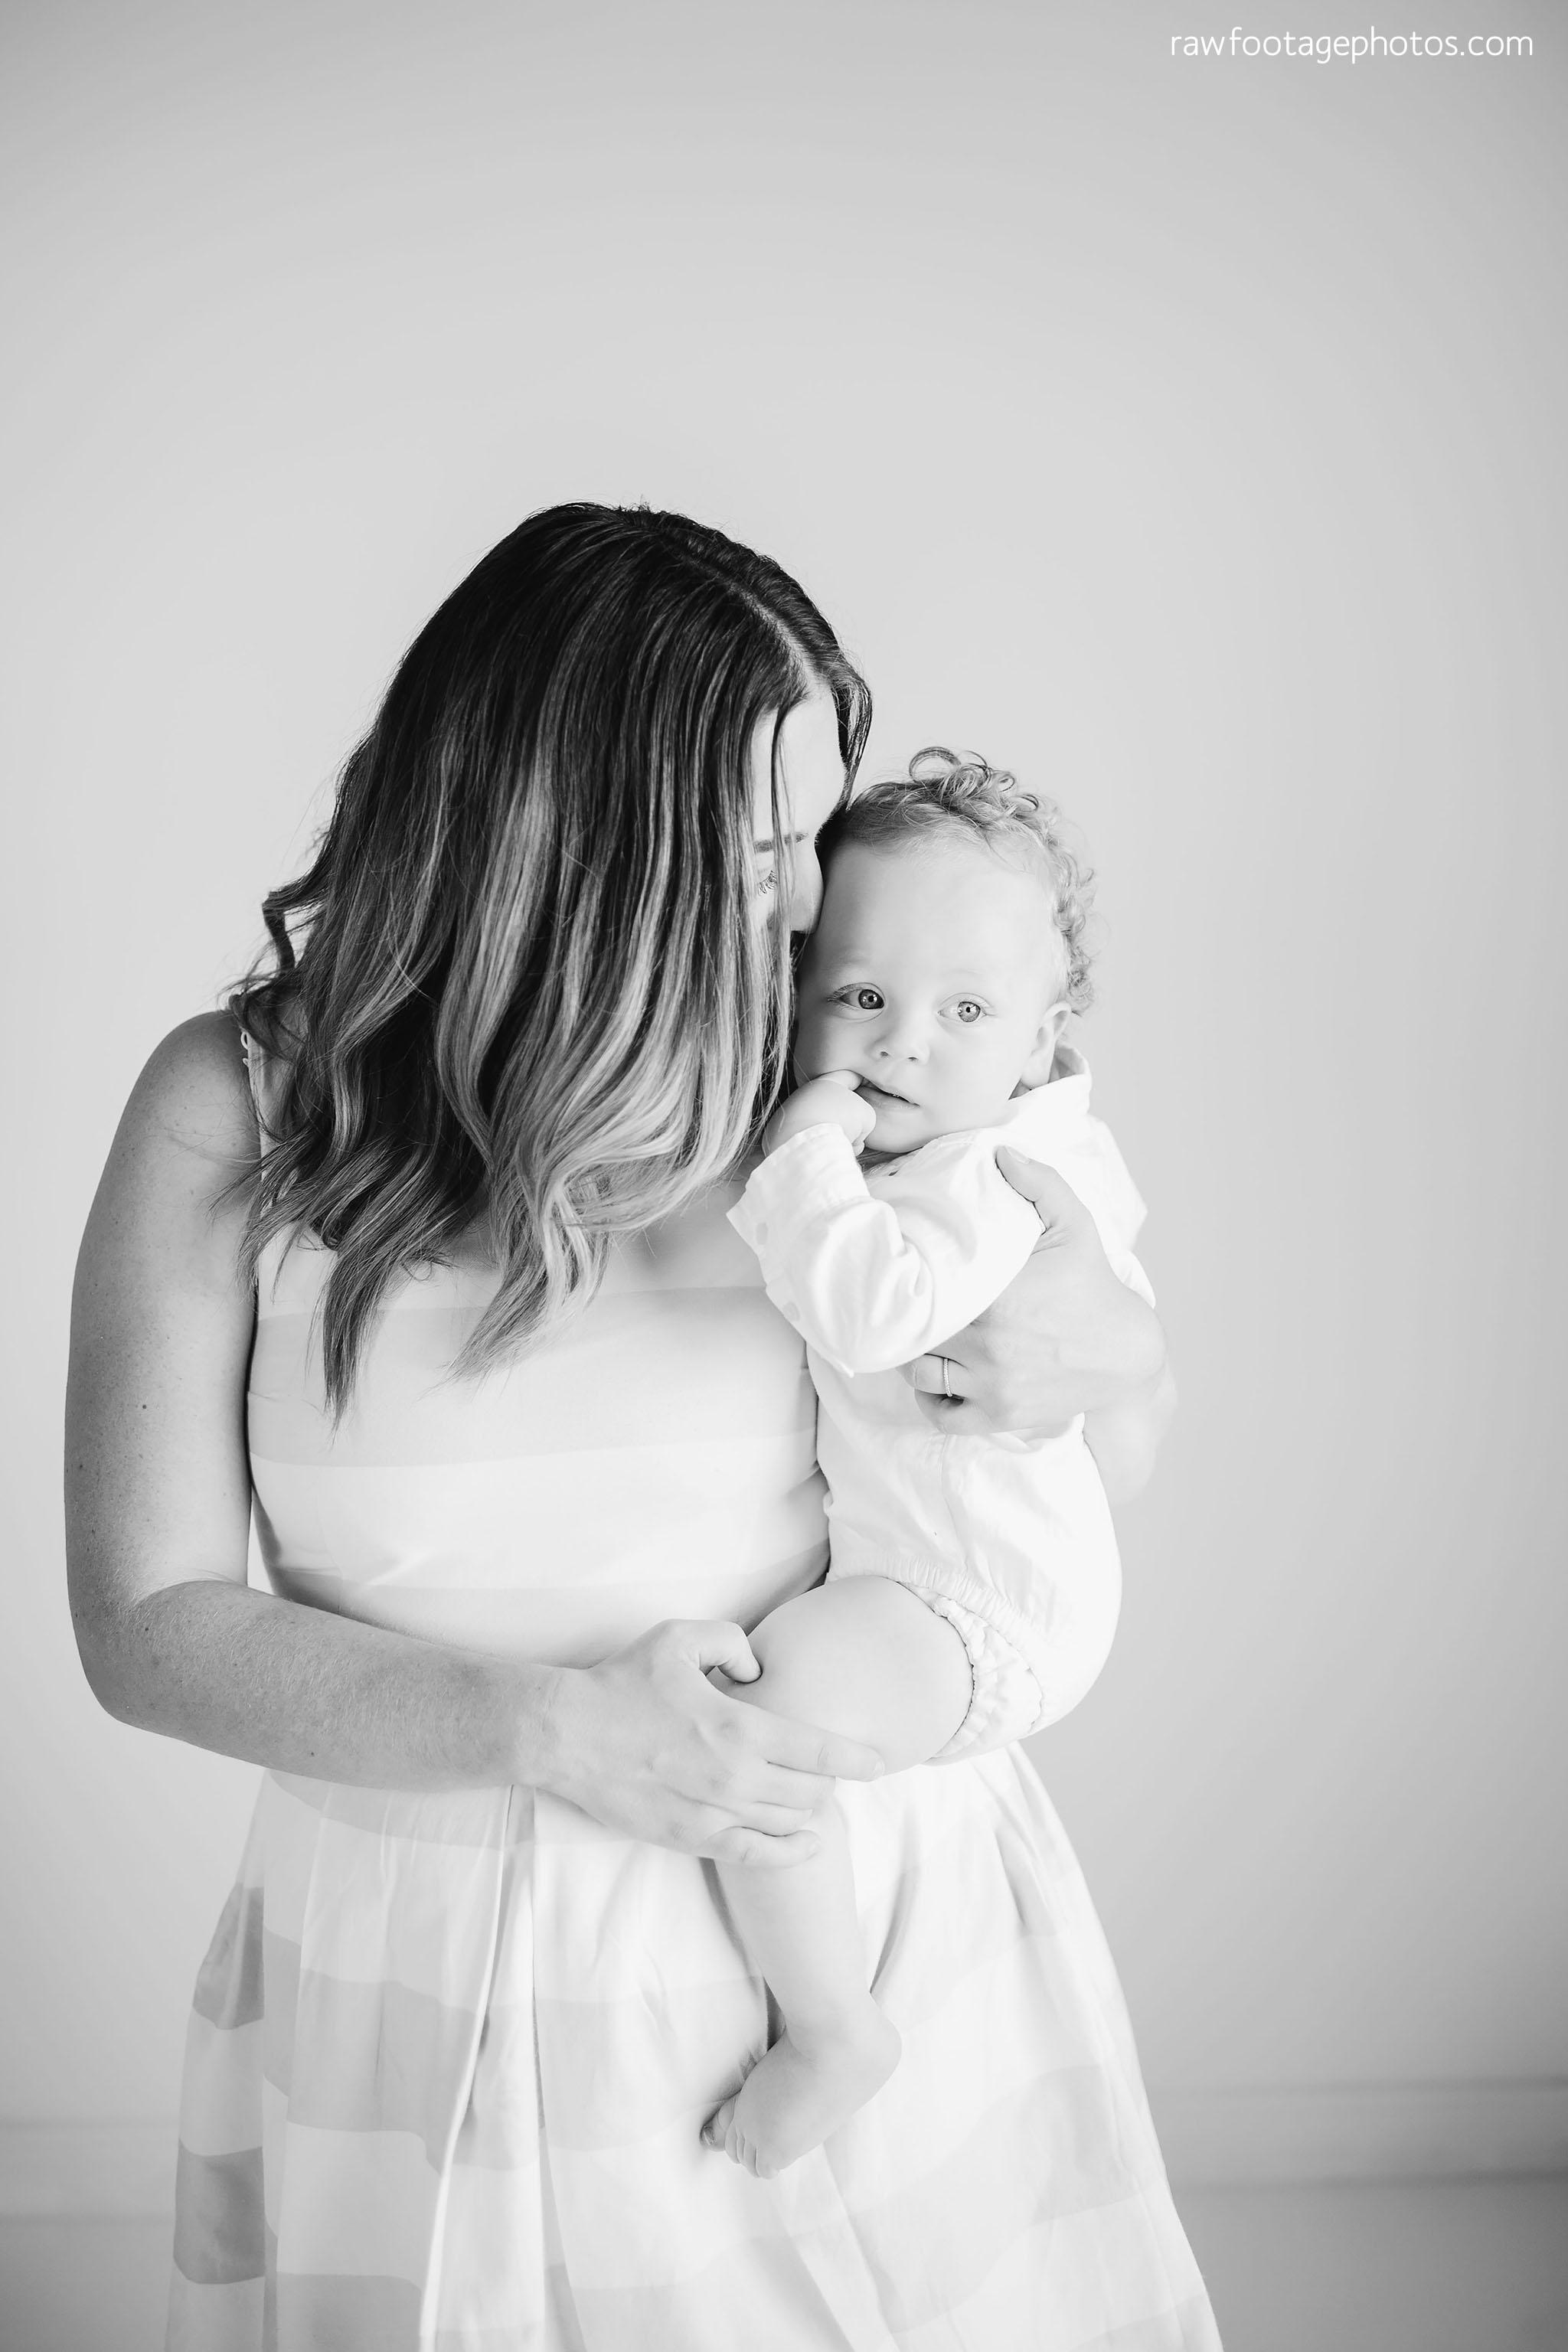 london_ontario_family_photographer-studio_photography-studio_lifestyle_portraits-white_studio-mother_son-candid_family_photography-raw_footage_photography010.jpg